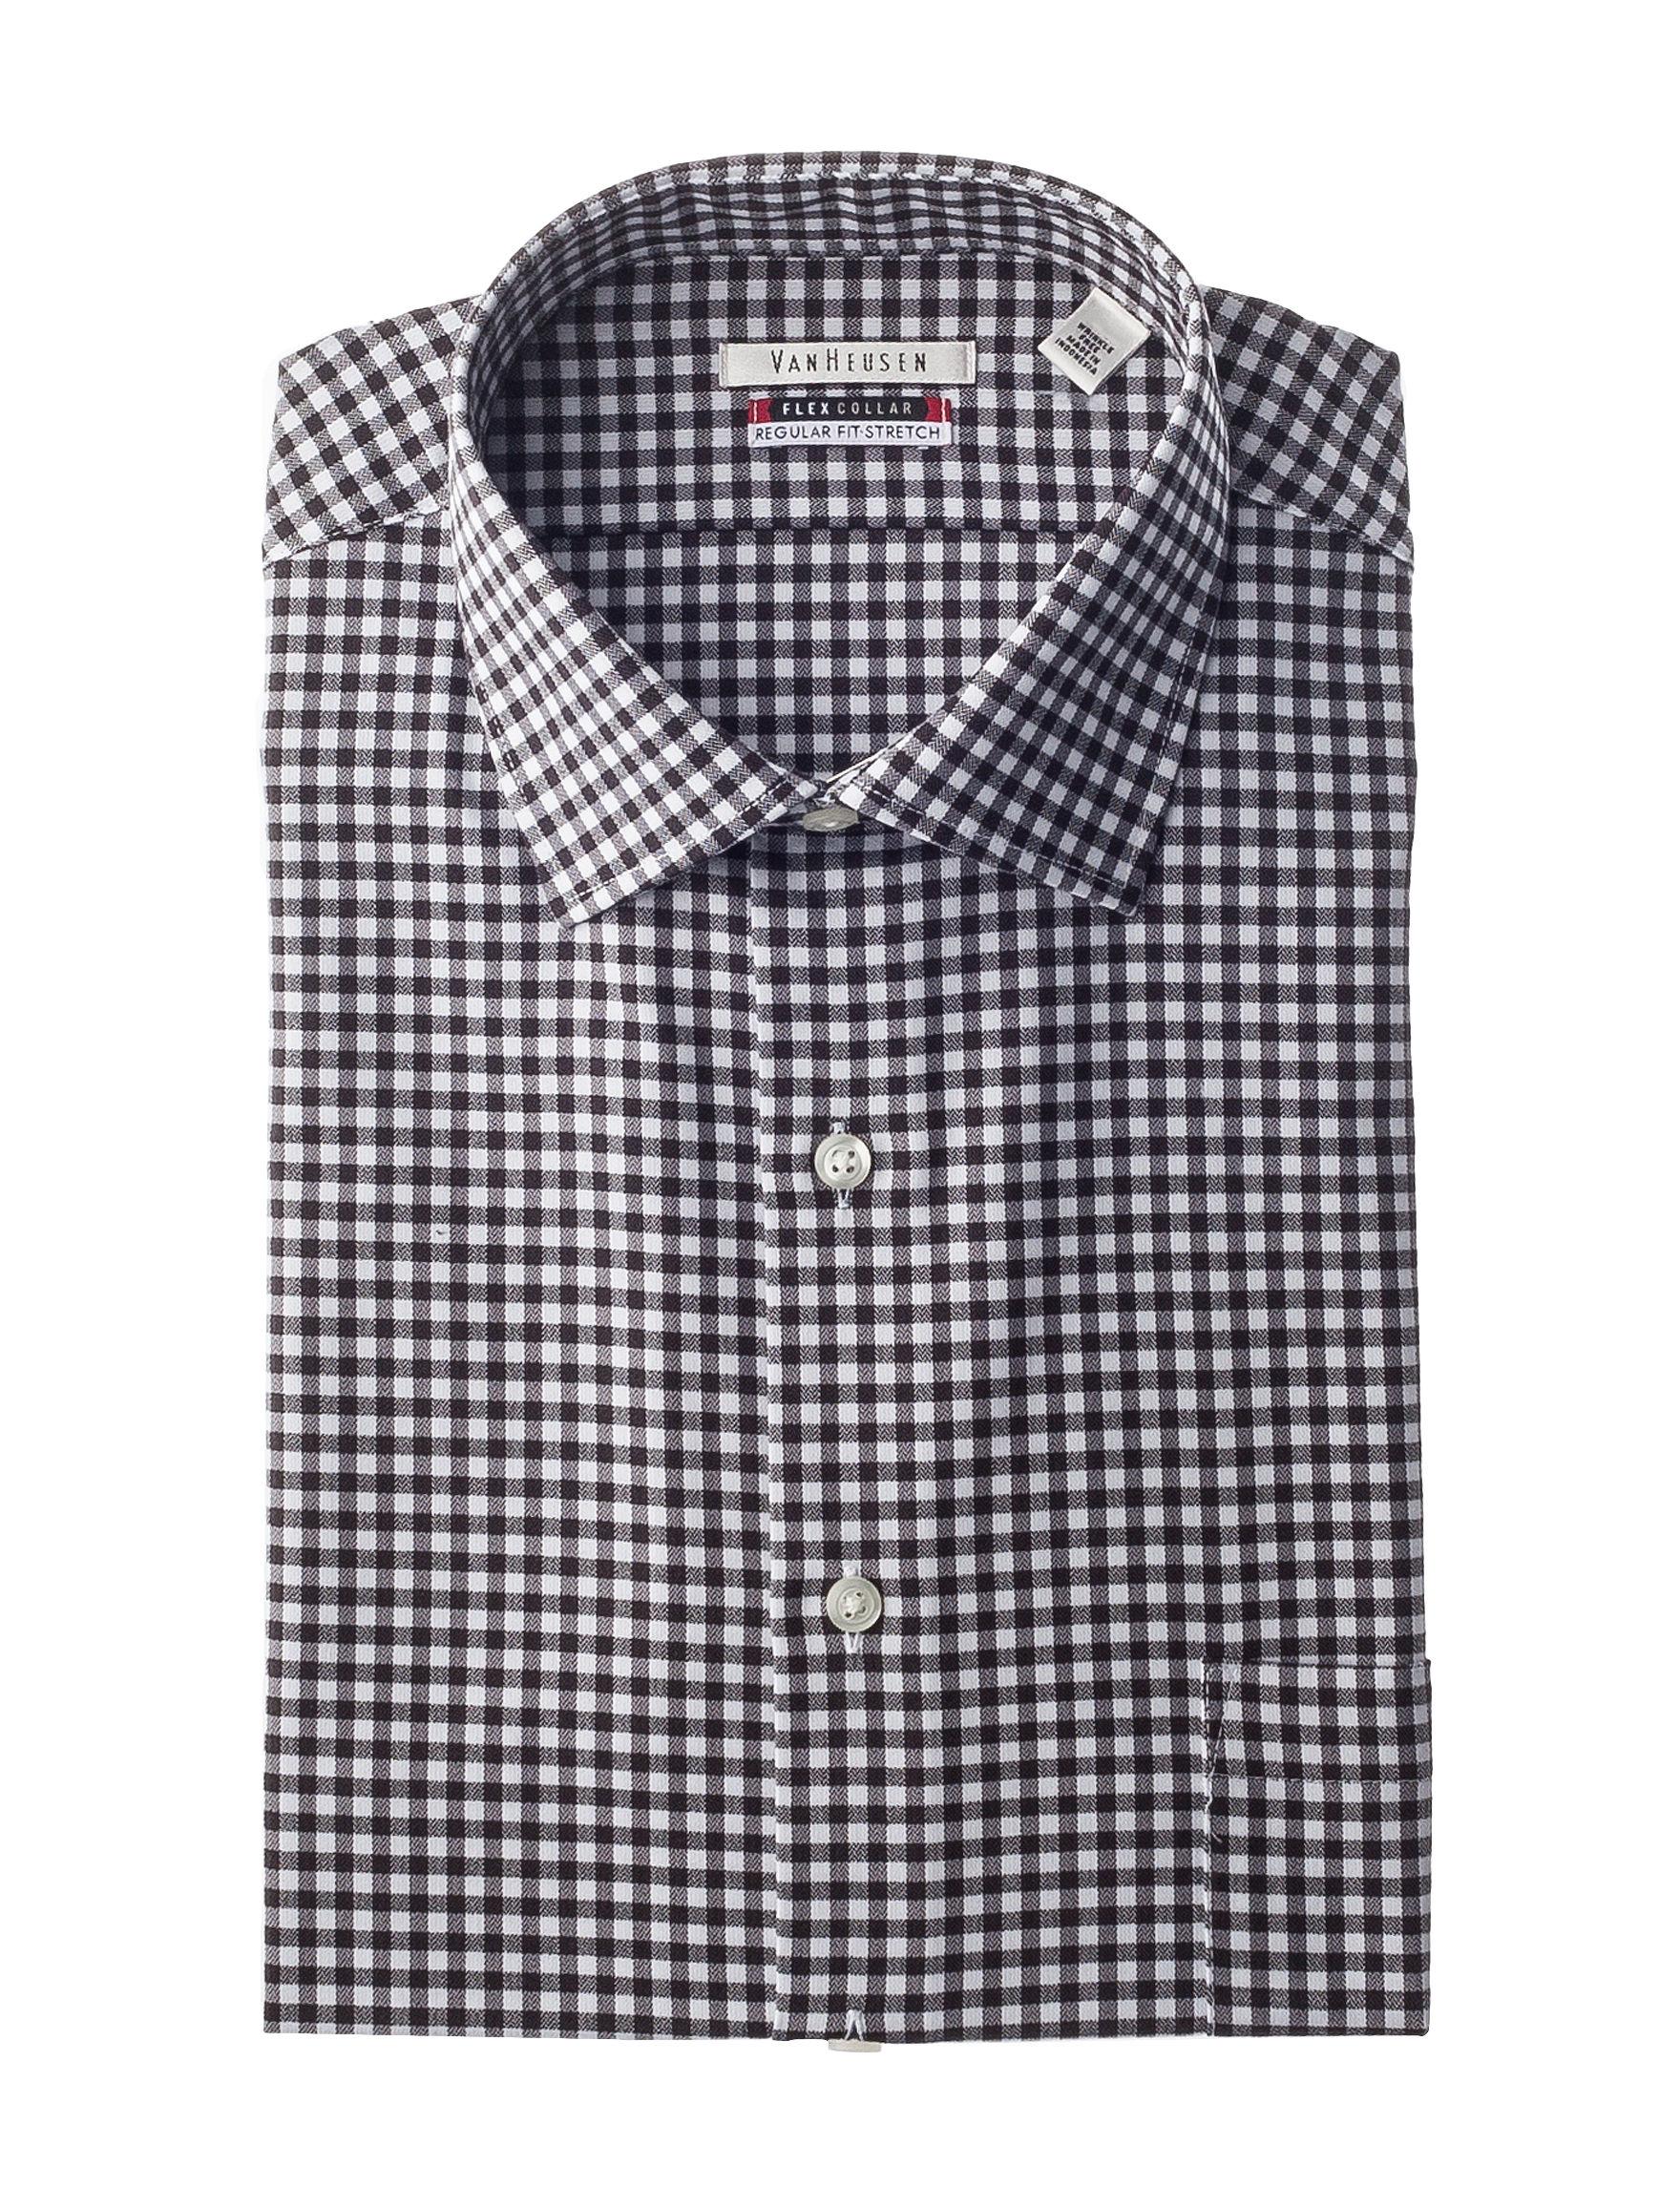 Van Heusen Black / White Dress Shirts